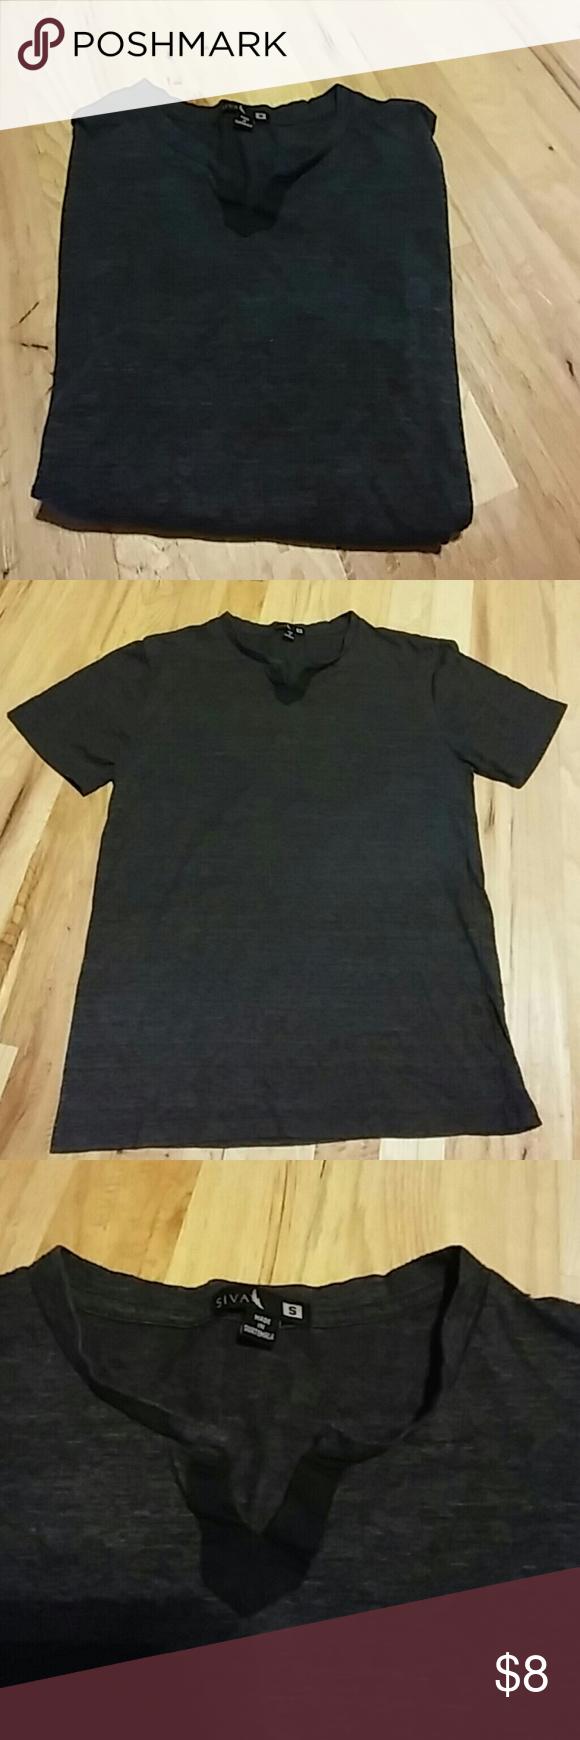 Dark Grey Vneck Mens Dark Grey Vneck Brand: Siva Size Small Siva Shirts Tees - Short Sleeve